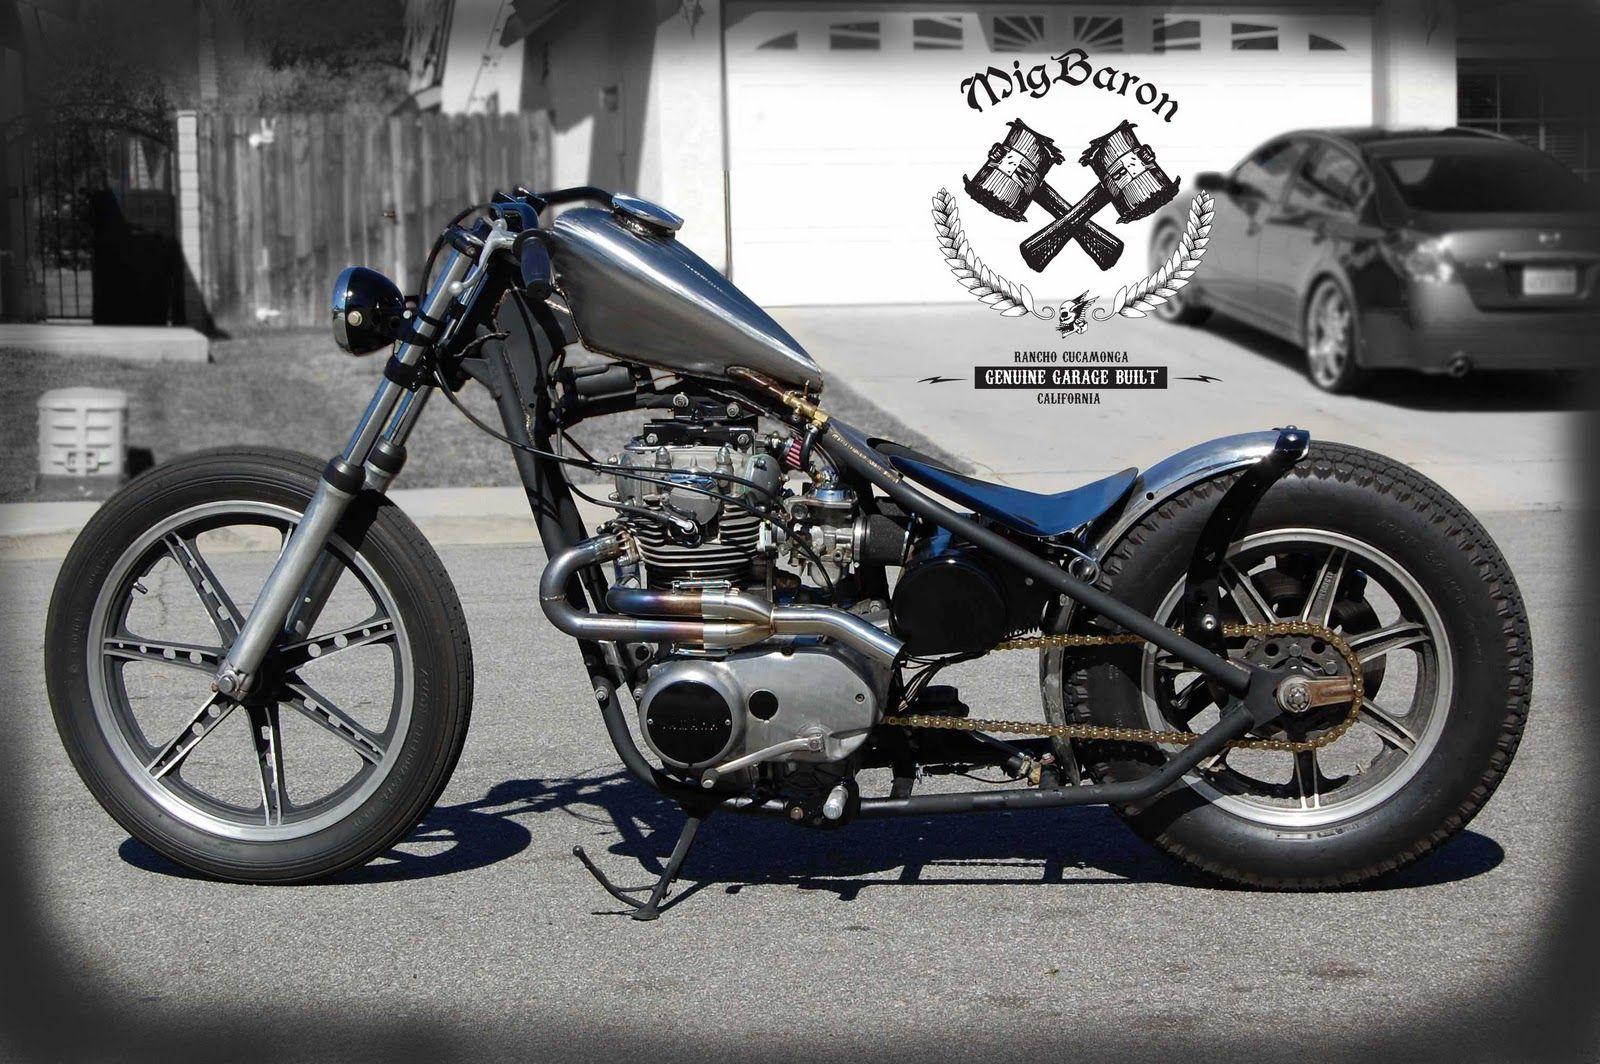 bobber | Da Shop Rag: Yamaha xs650 bobber for sale 5k obo | Bikes ...